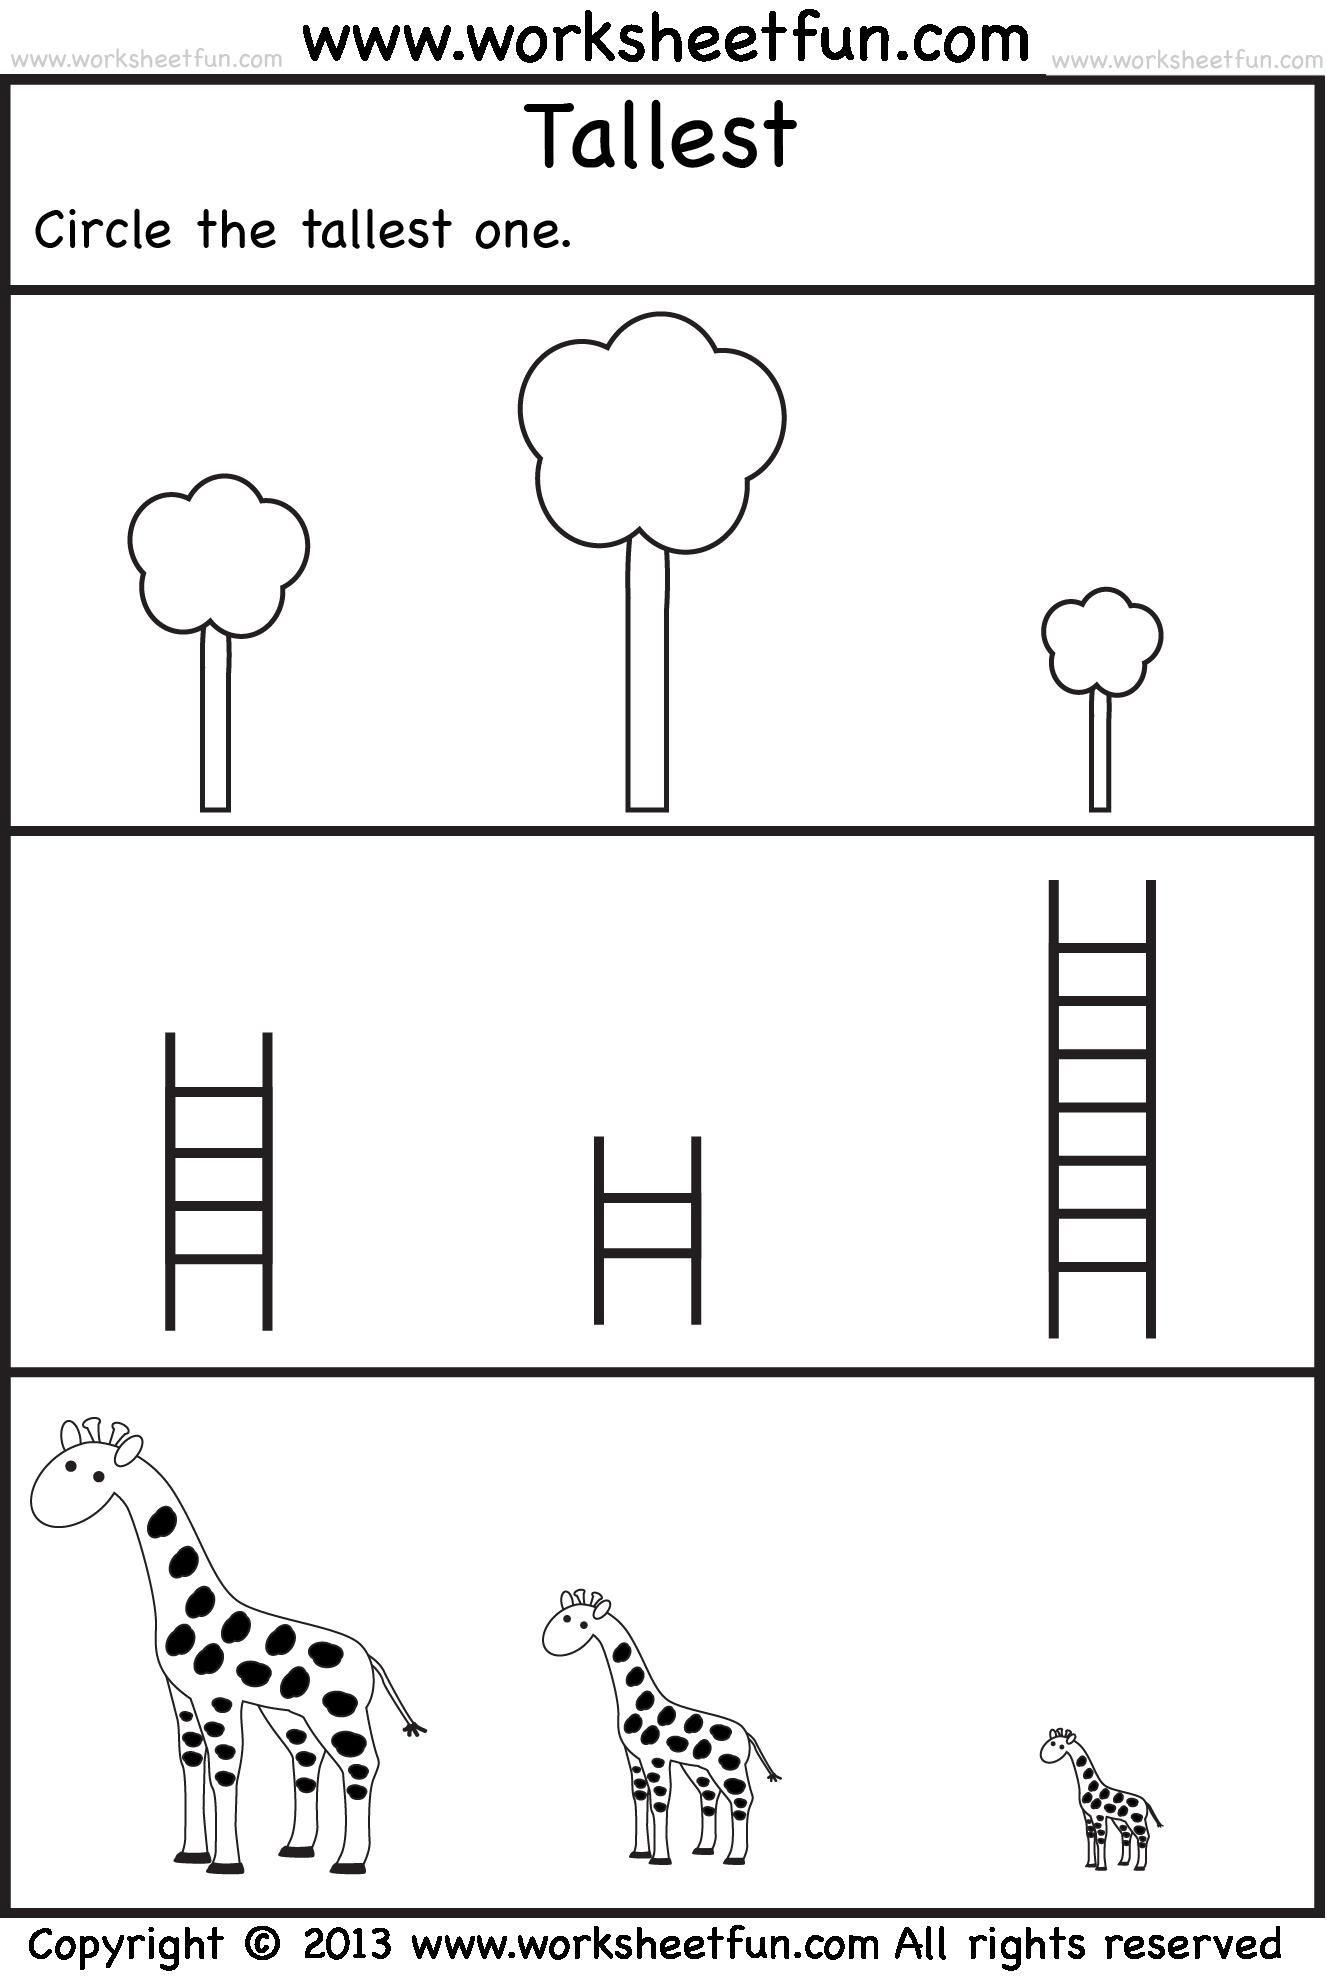 Worksheet For Nursery Alphabets